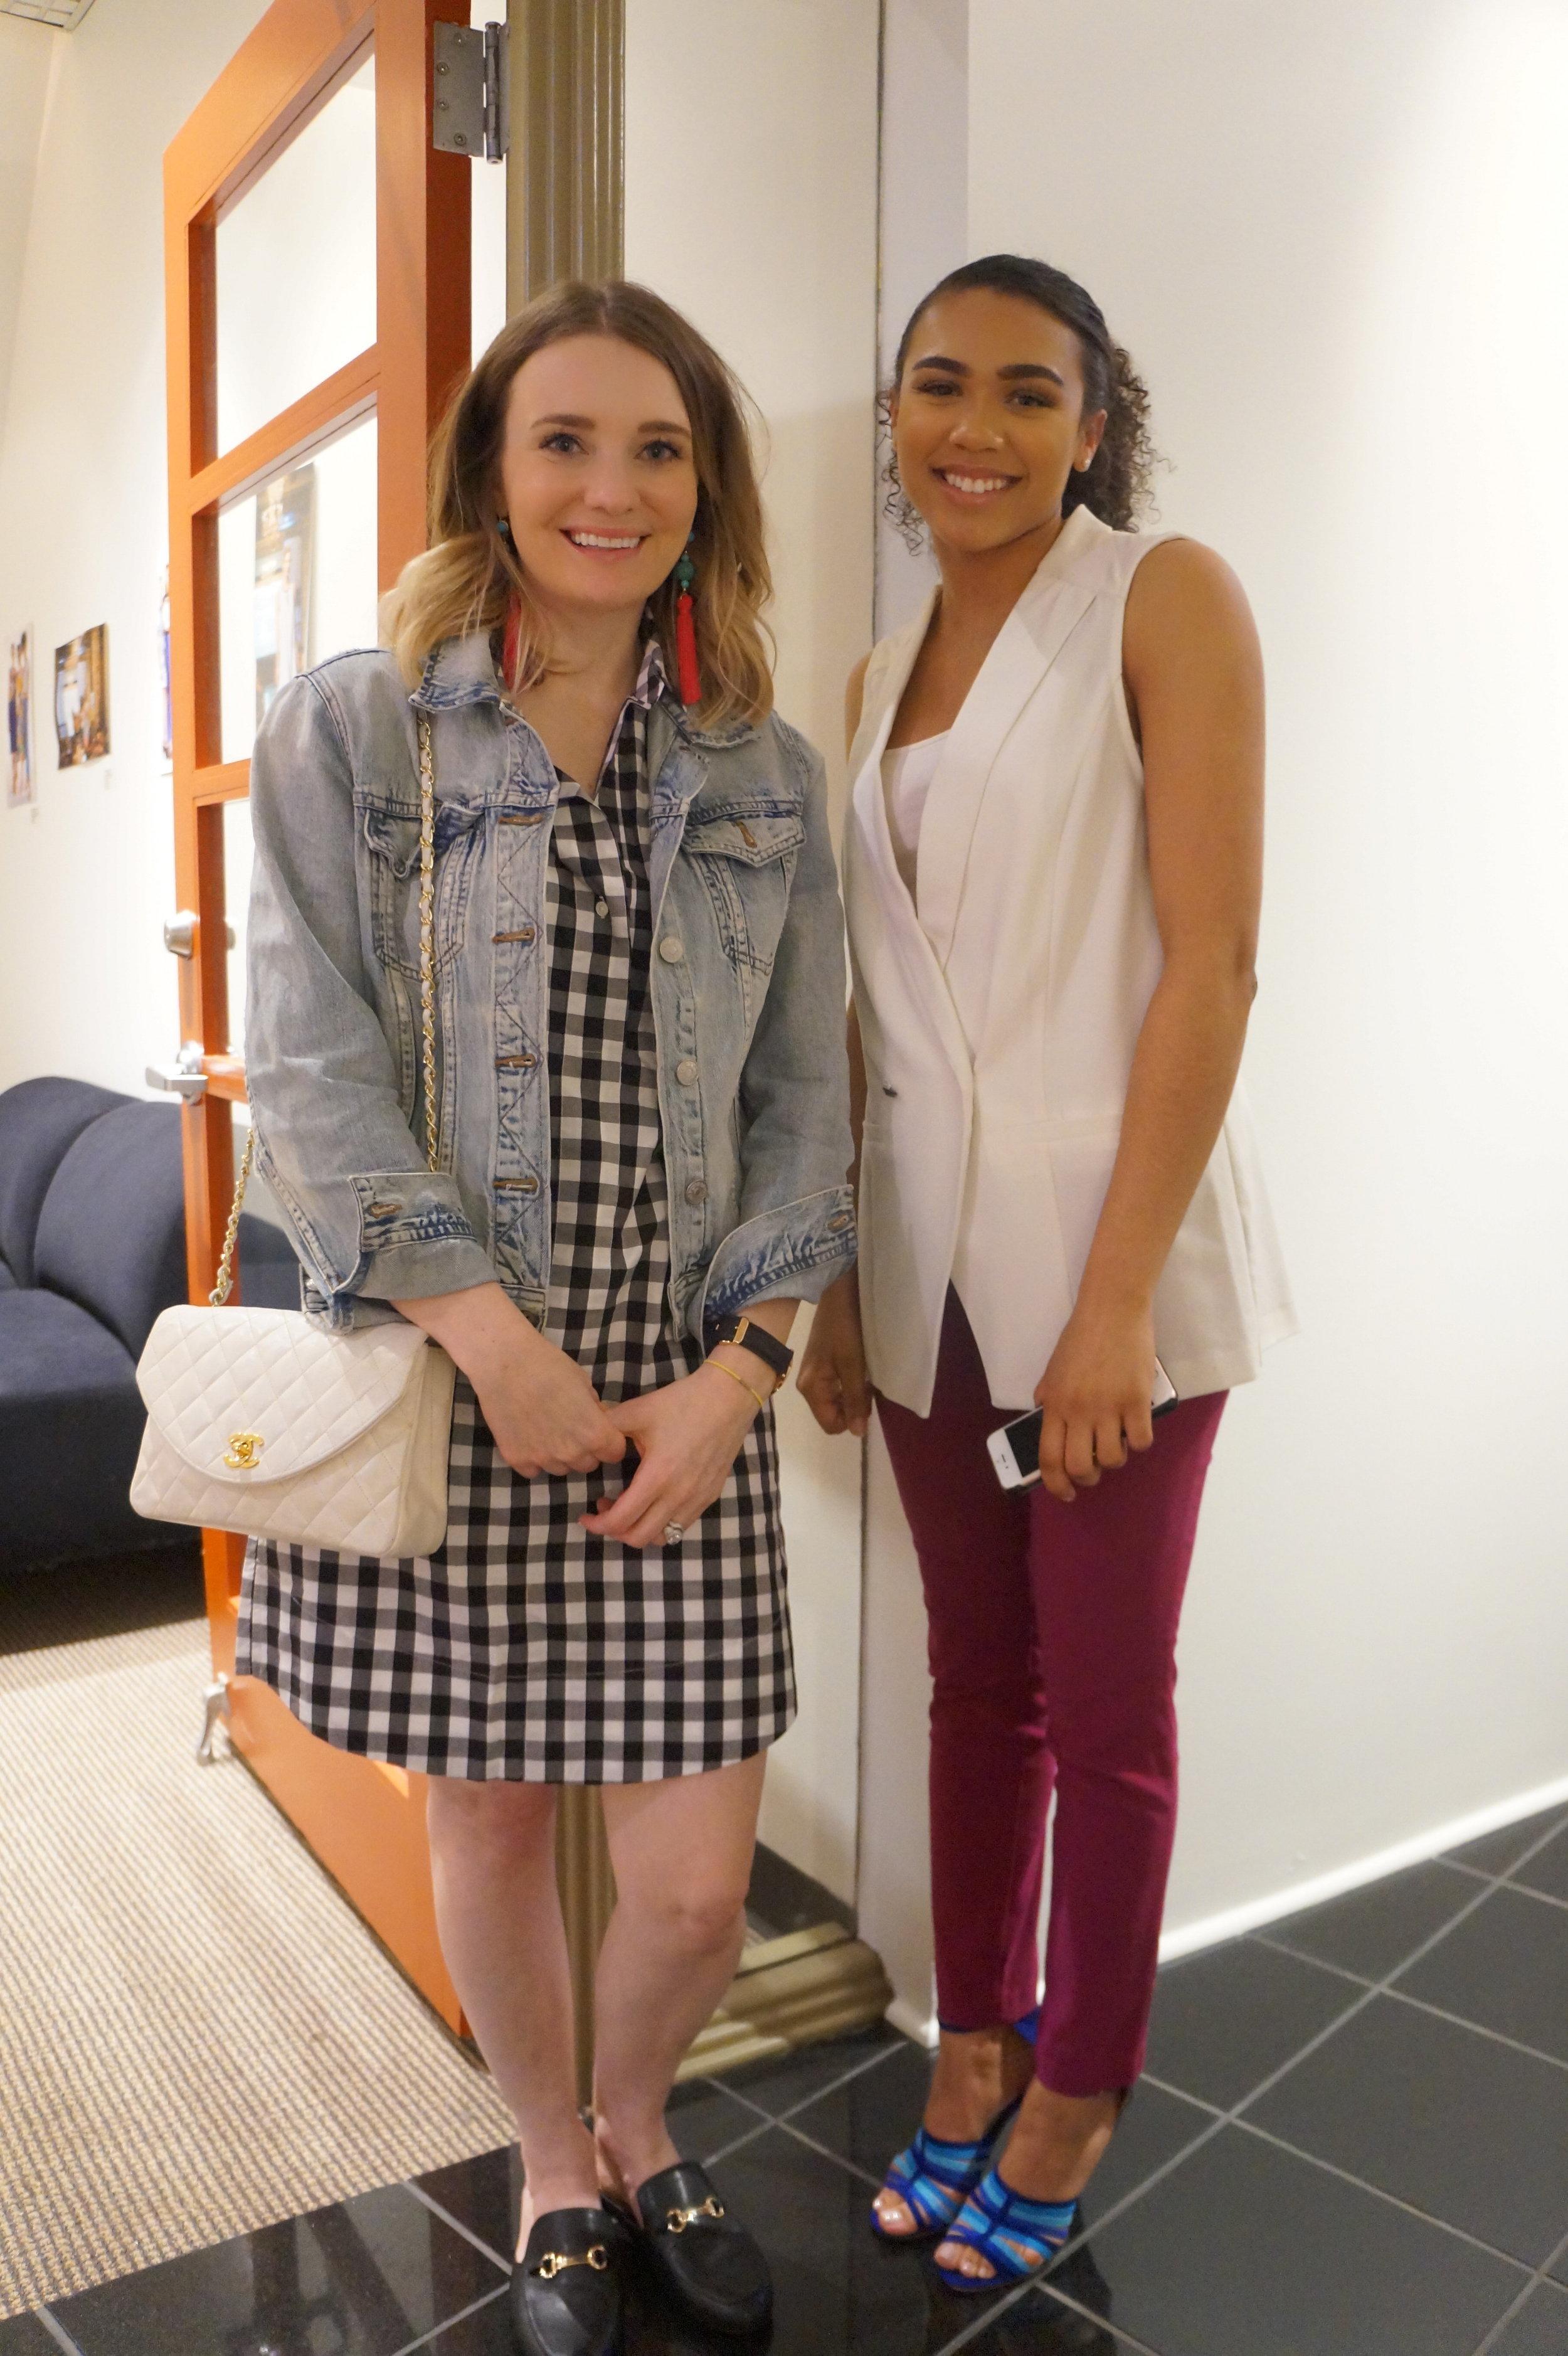 Andrea Fenise covers Memphis Fashion Week's Media Night